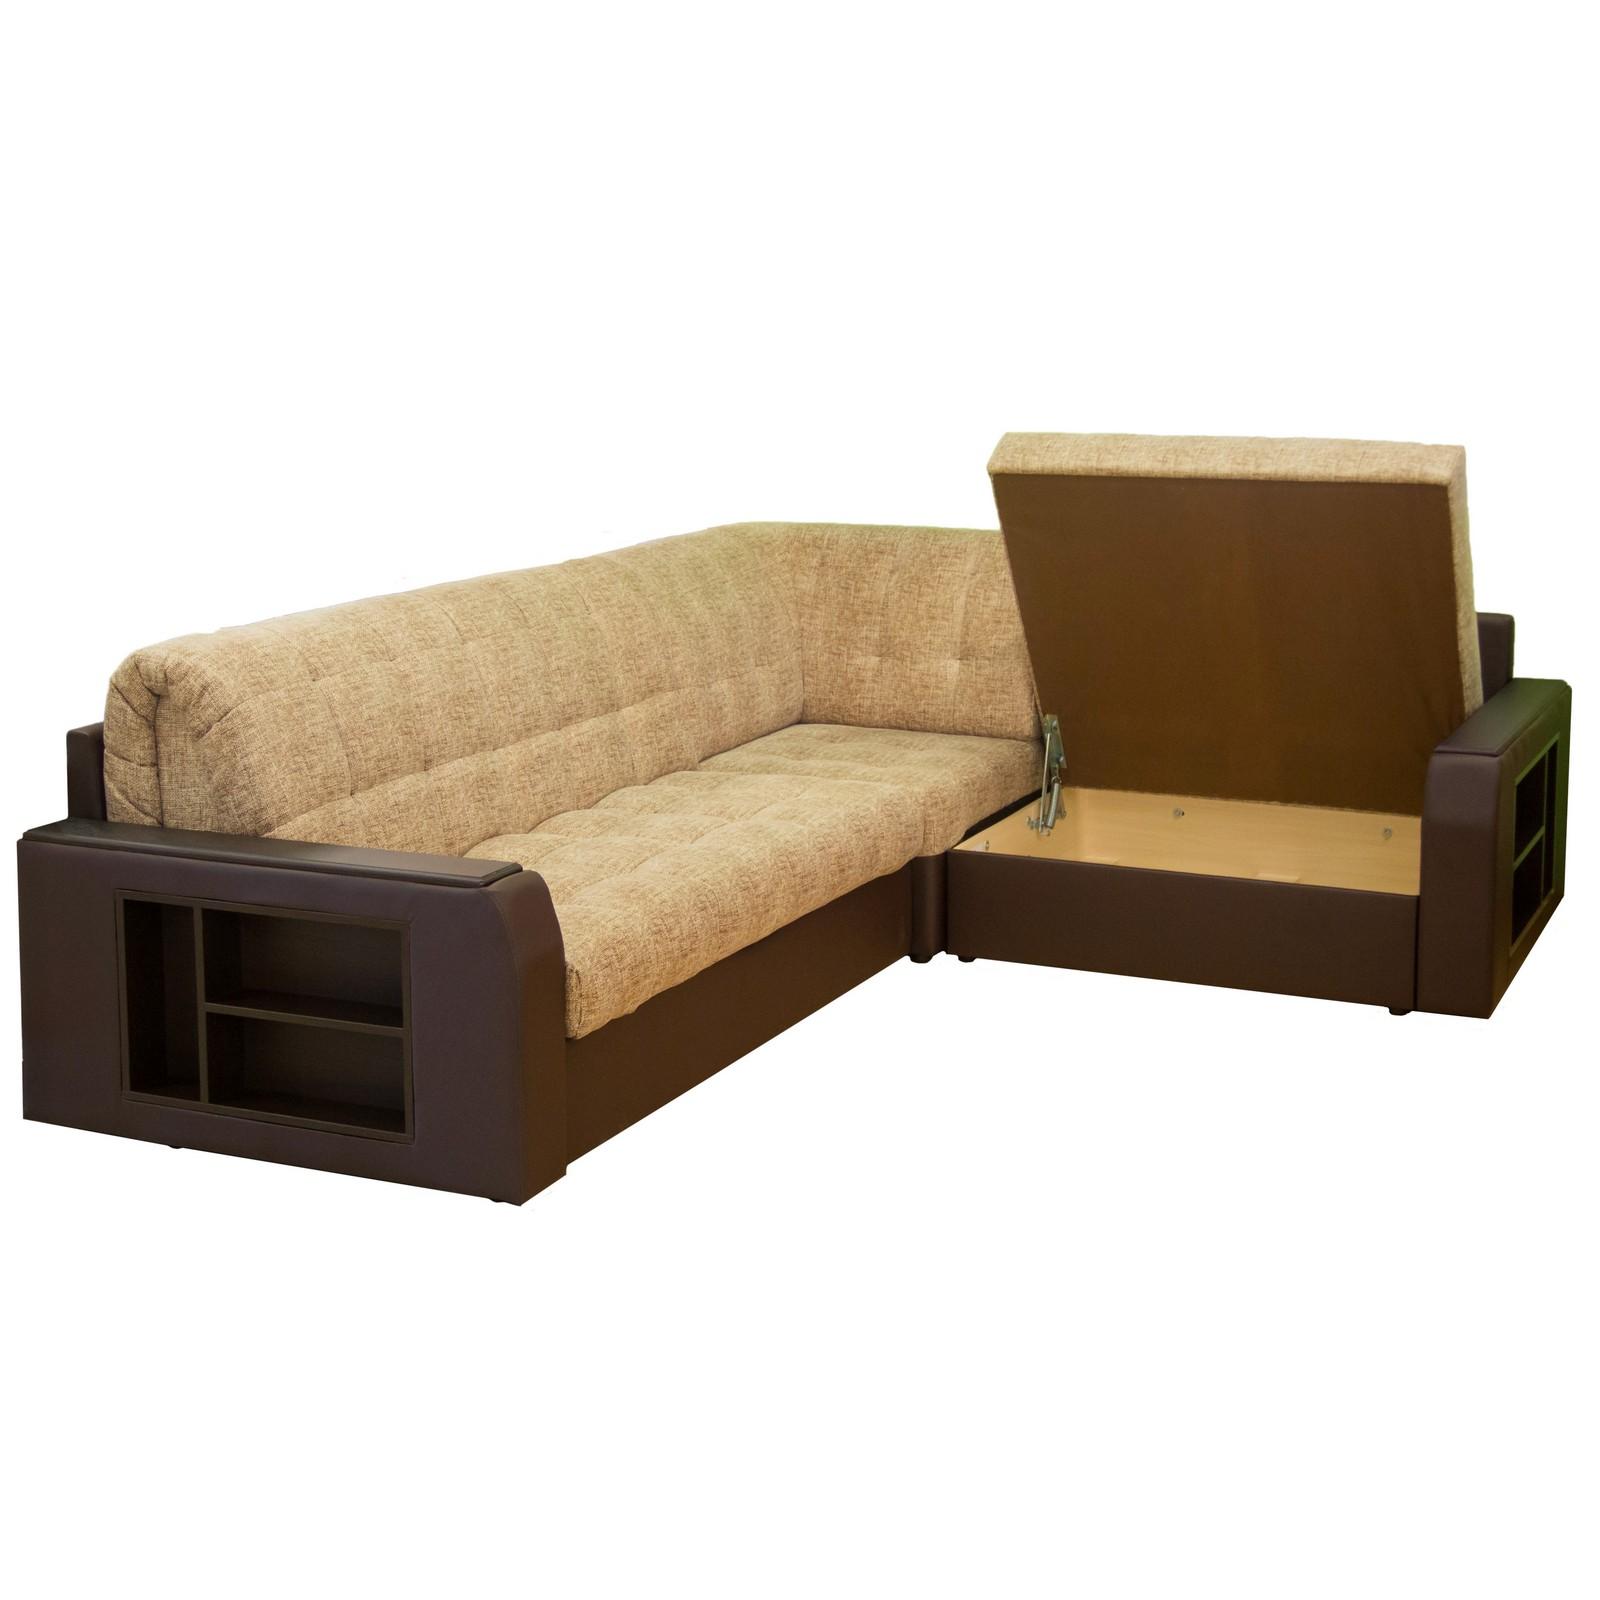 Мебельная фабрика каталог диваны